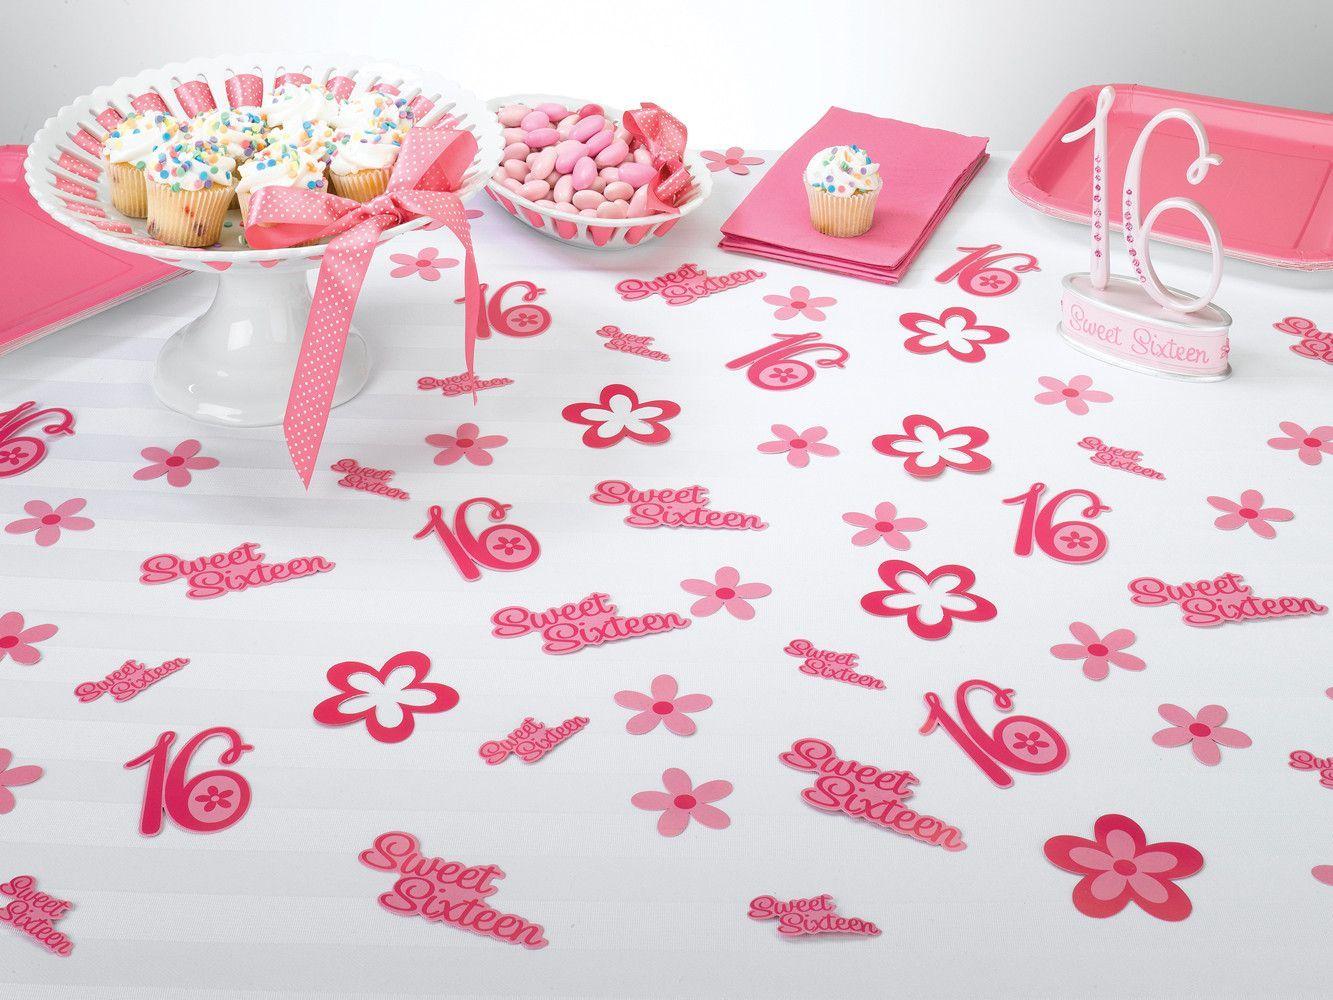 Sweet Sixteen Confetti